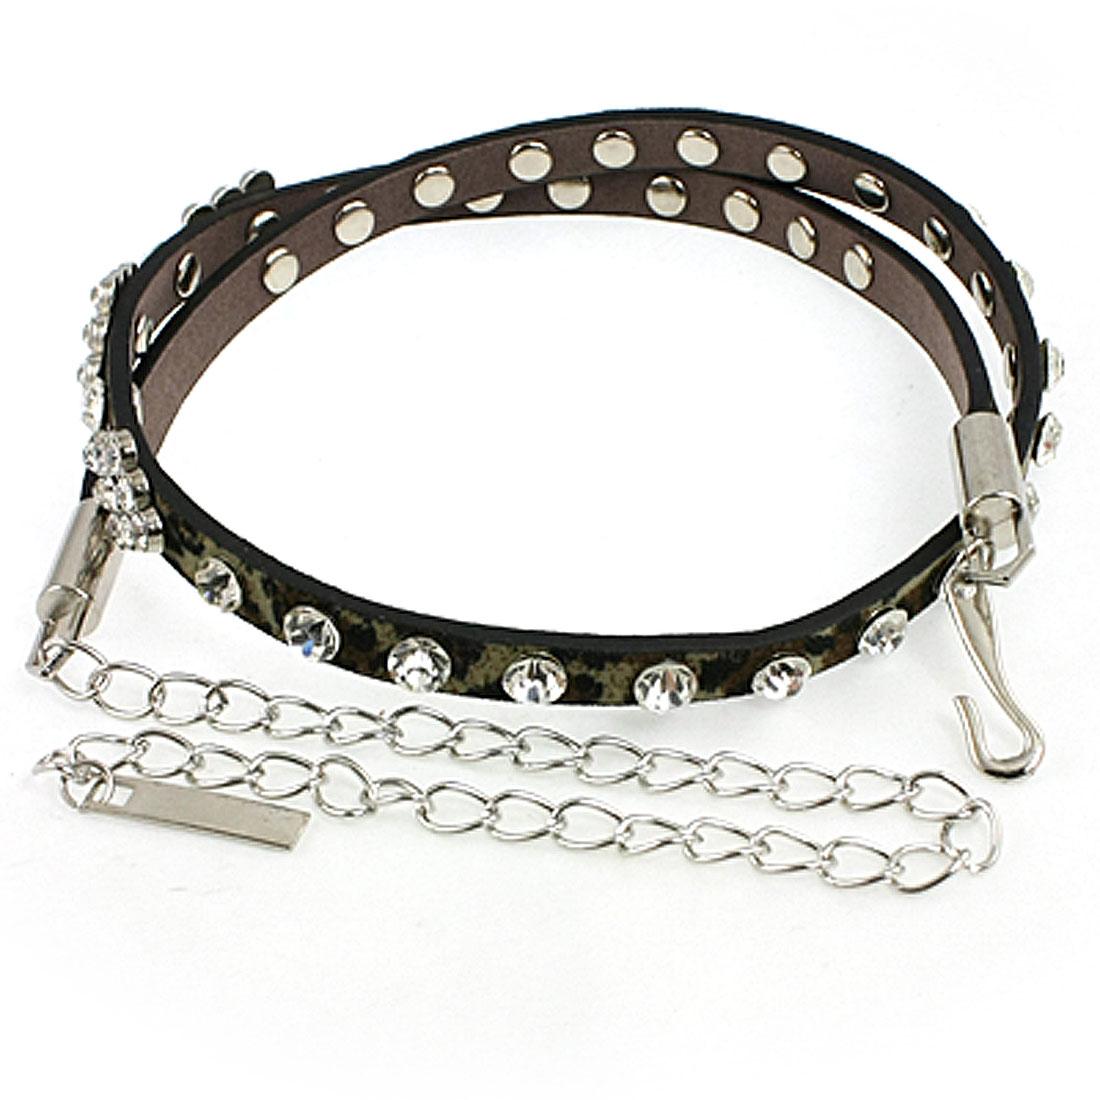 Woman Rhinestone Detail Leopard Print Faux Leather Adjustable Belt